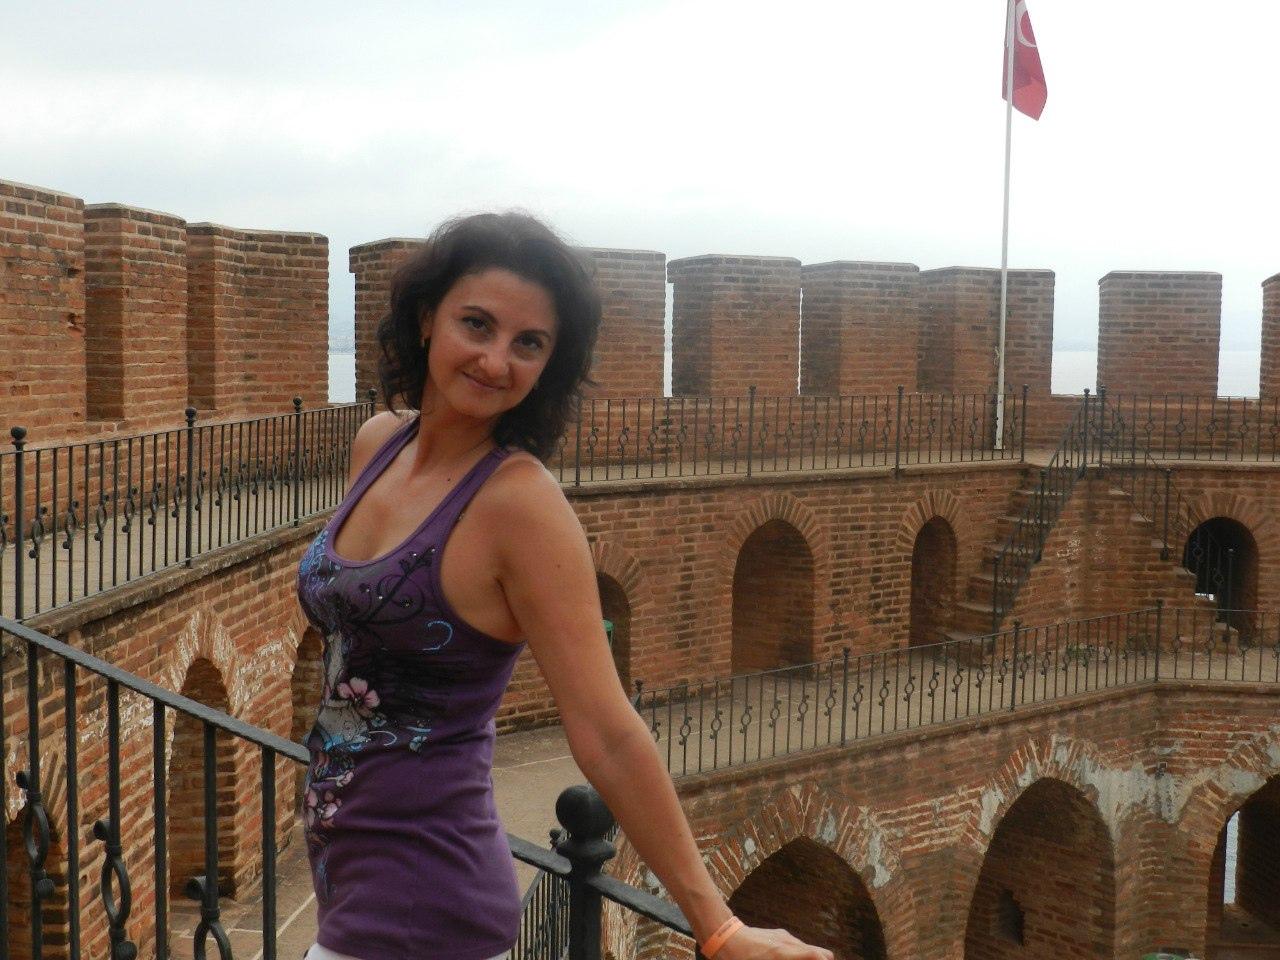 photo from album of Svetlana Gileva №2